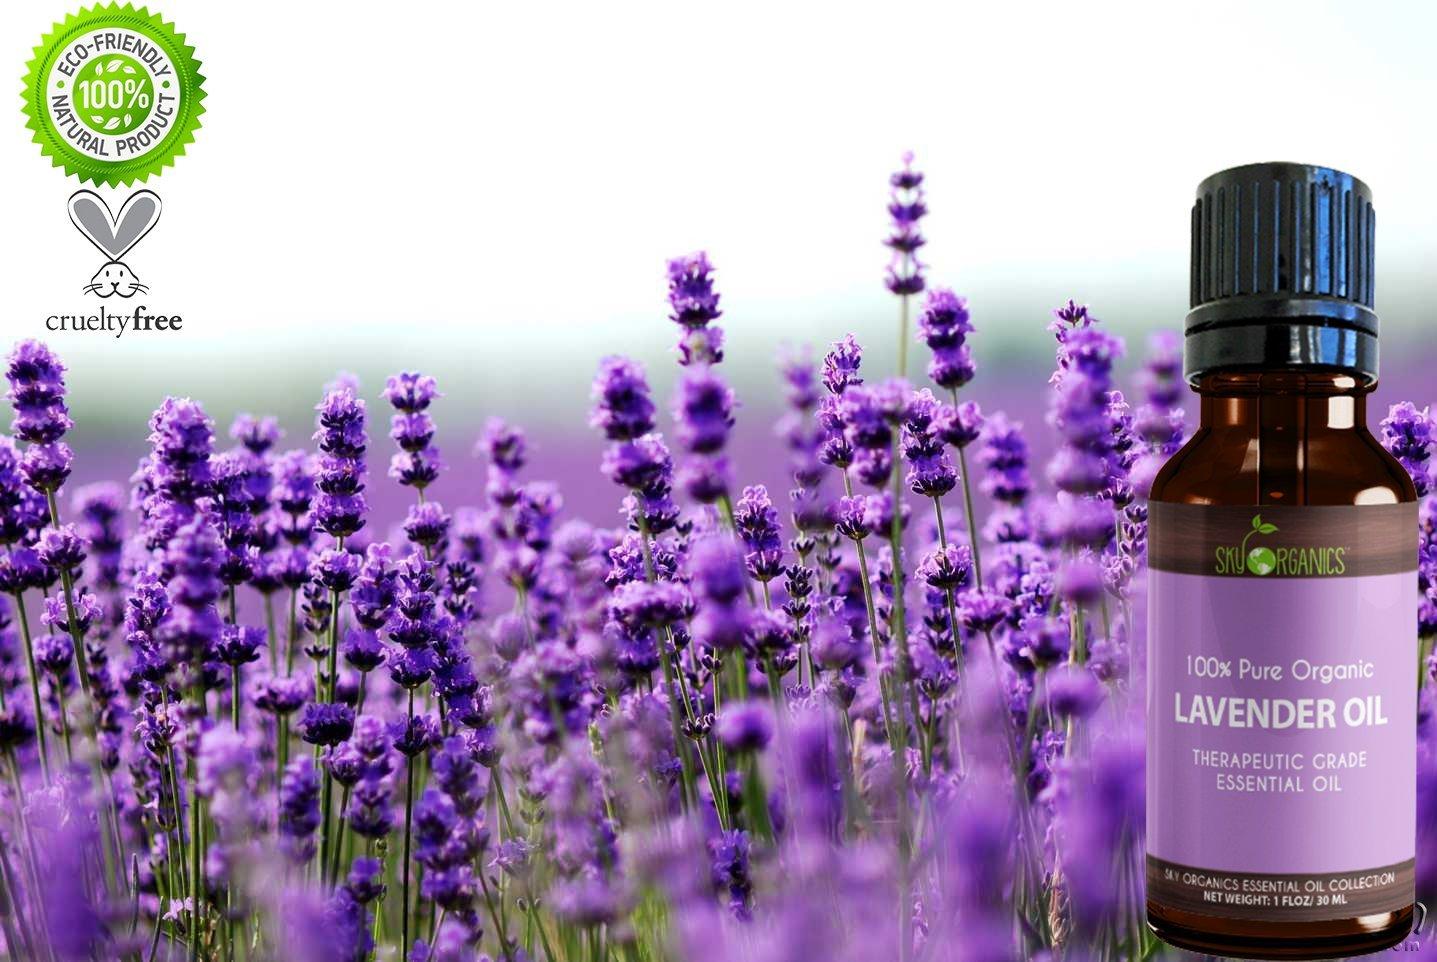 4 Best Ways To Use Essential Oils